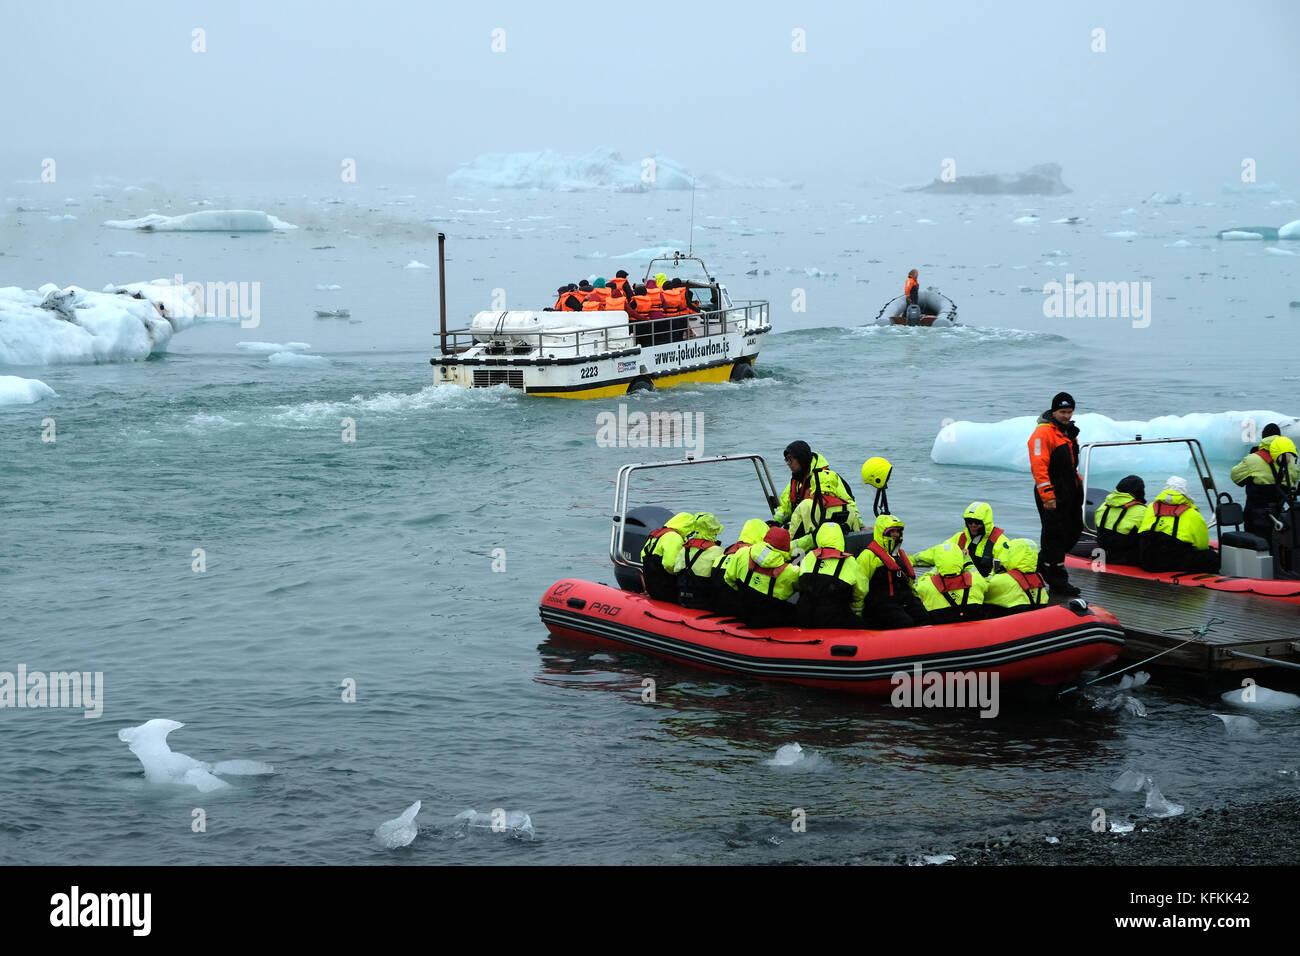 Tourists In Zodiac Boats Leaving Shore Jokulsarlon Glacial Lagoon